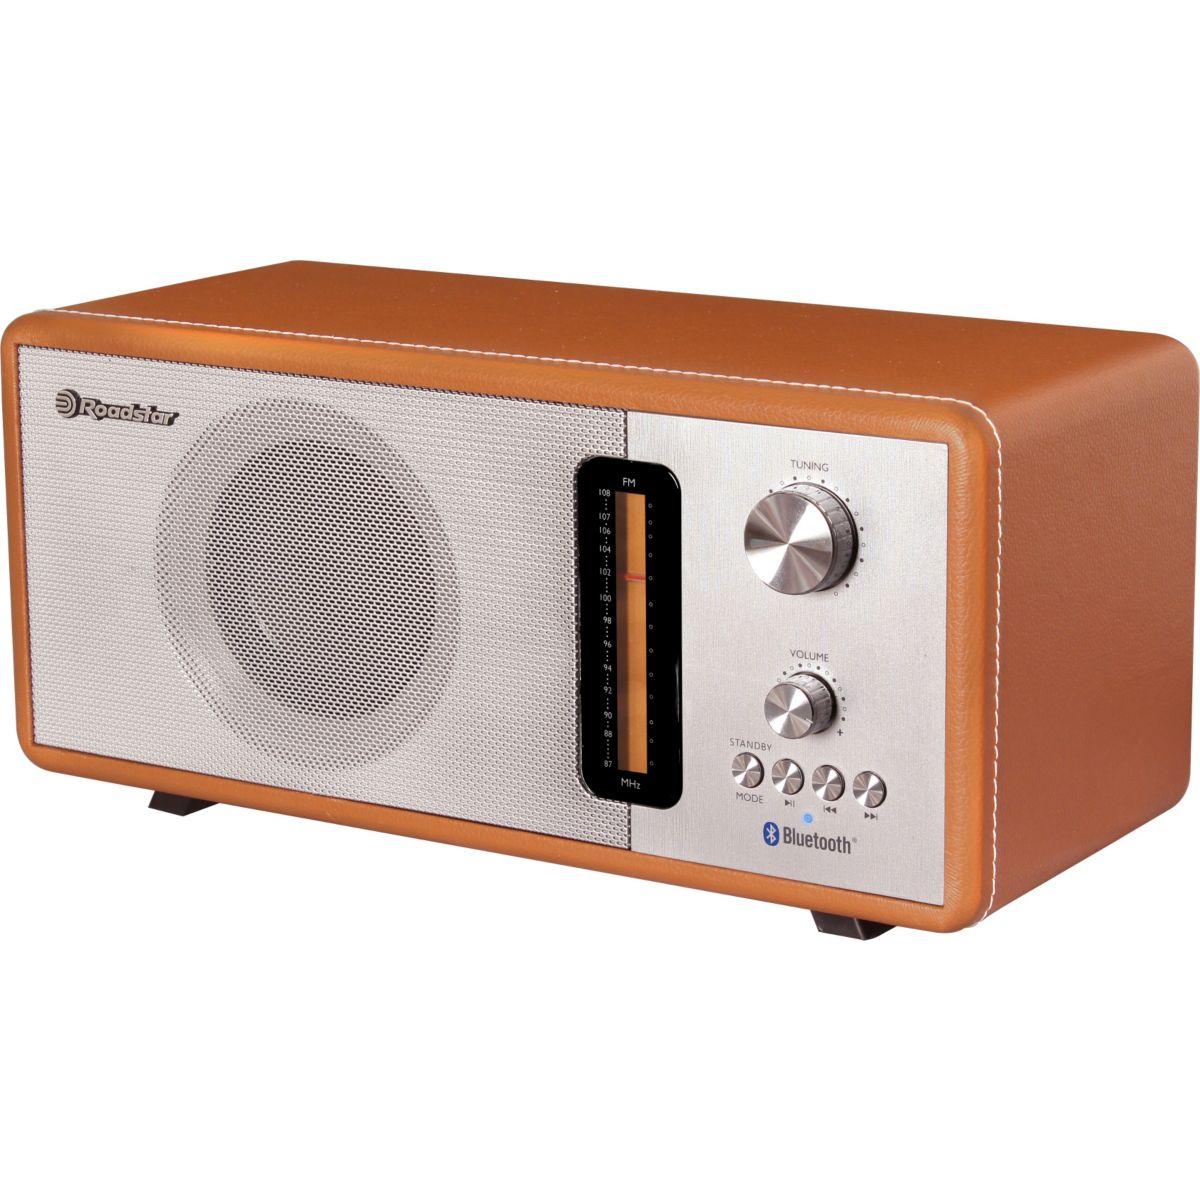 Radio analogique ROADSTAR HRA-1350US/BT